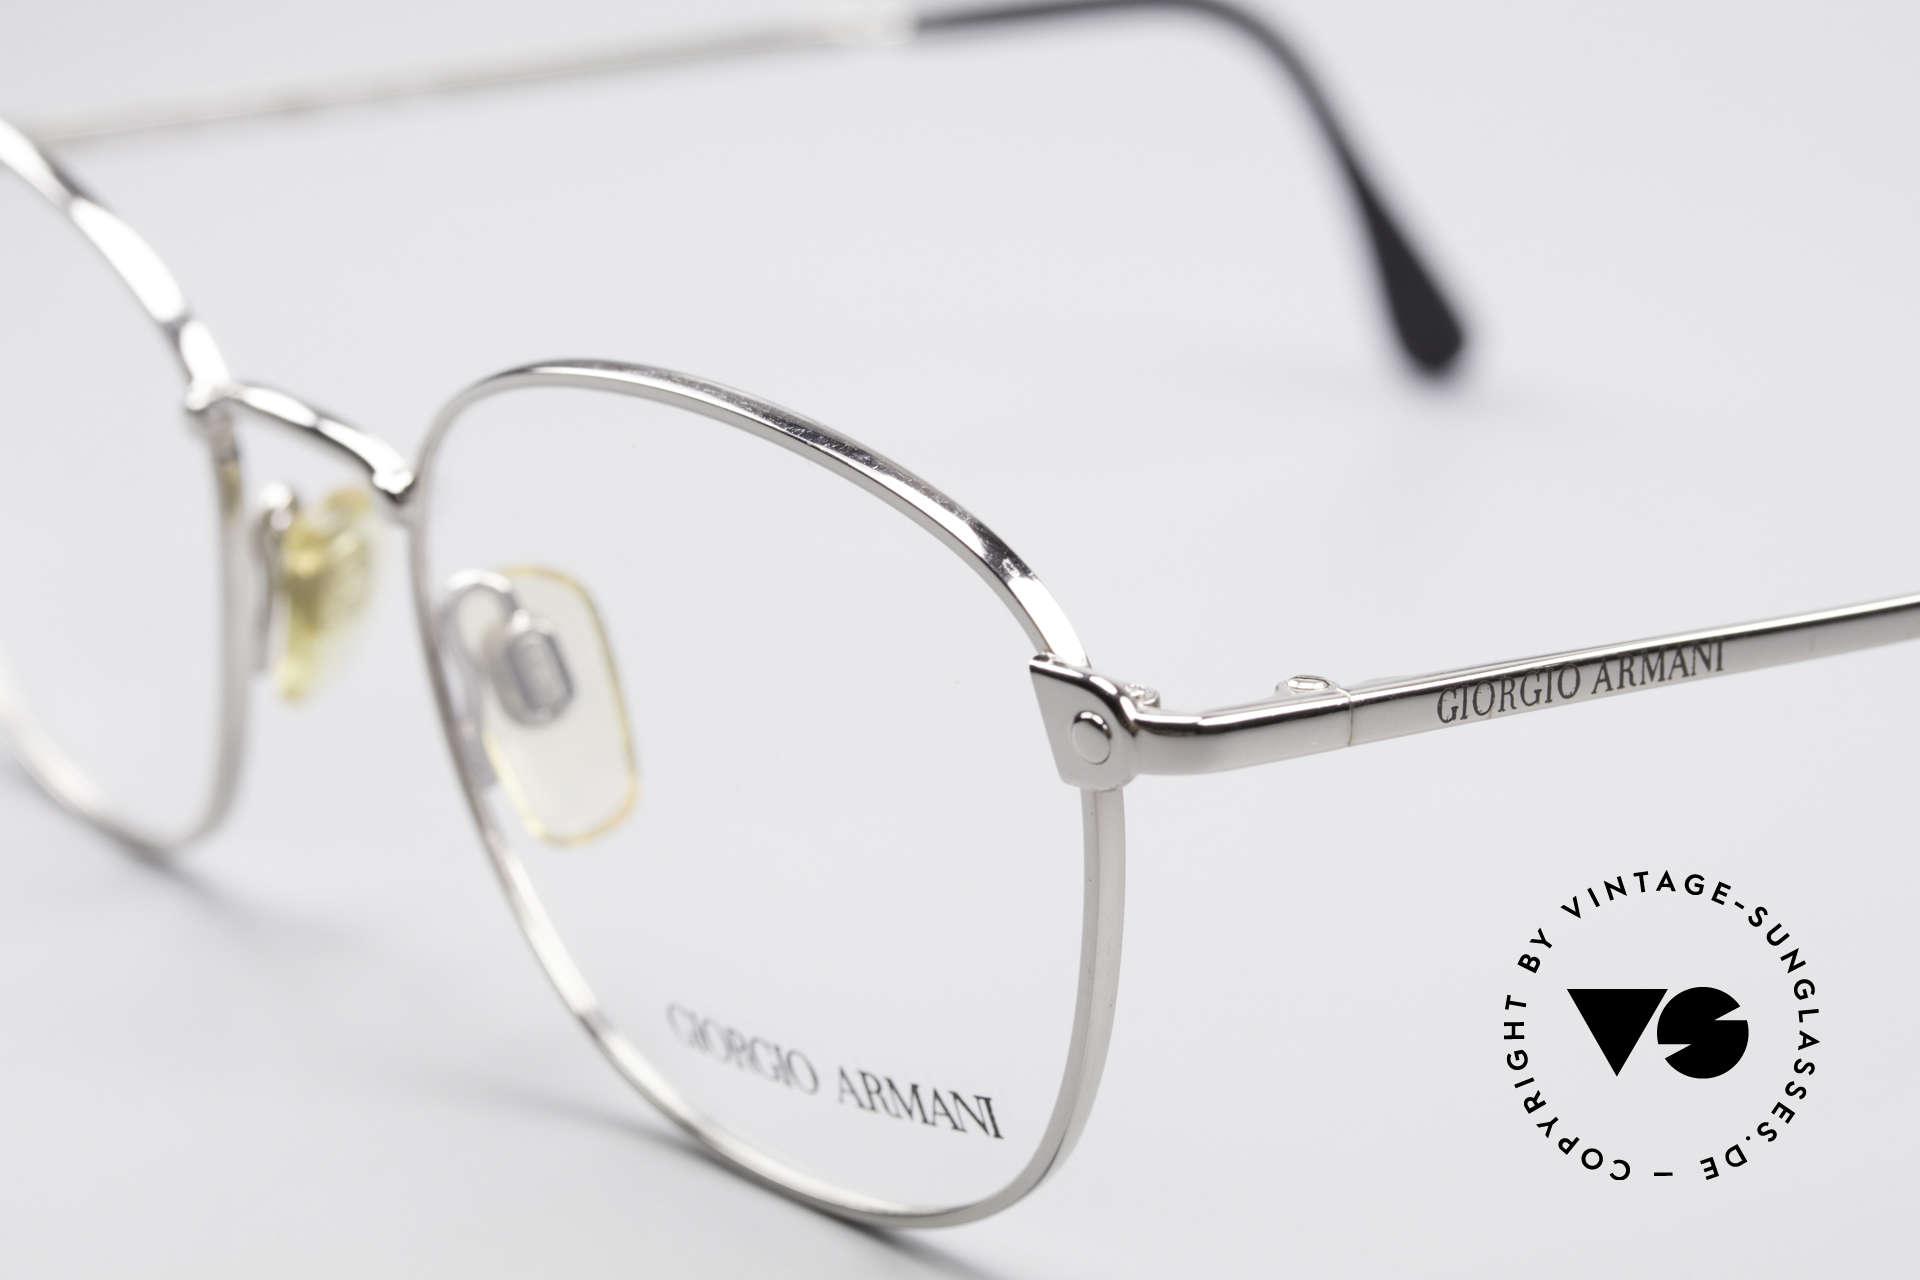 Giorgio Armani 168 Men's Vintage Eyeglasses 80's, never worn (like all our 1980's designer classics), Made for Men